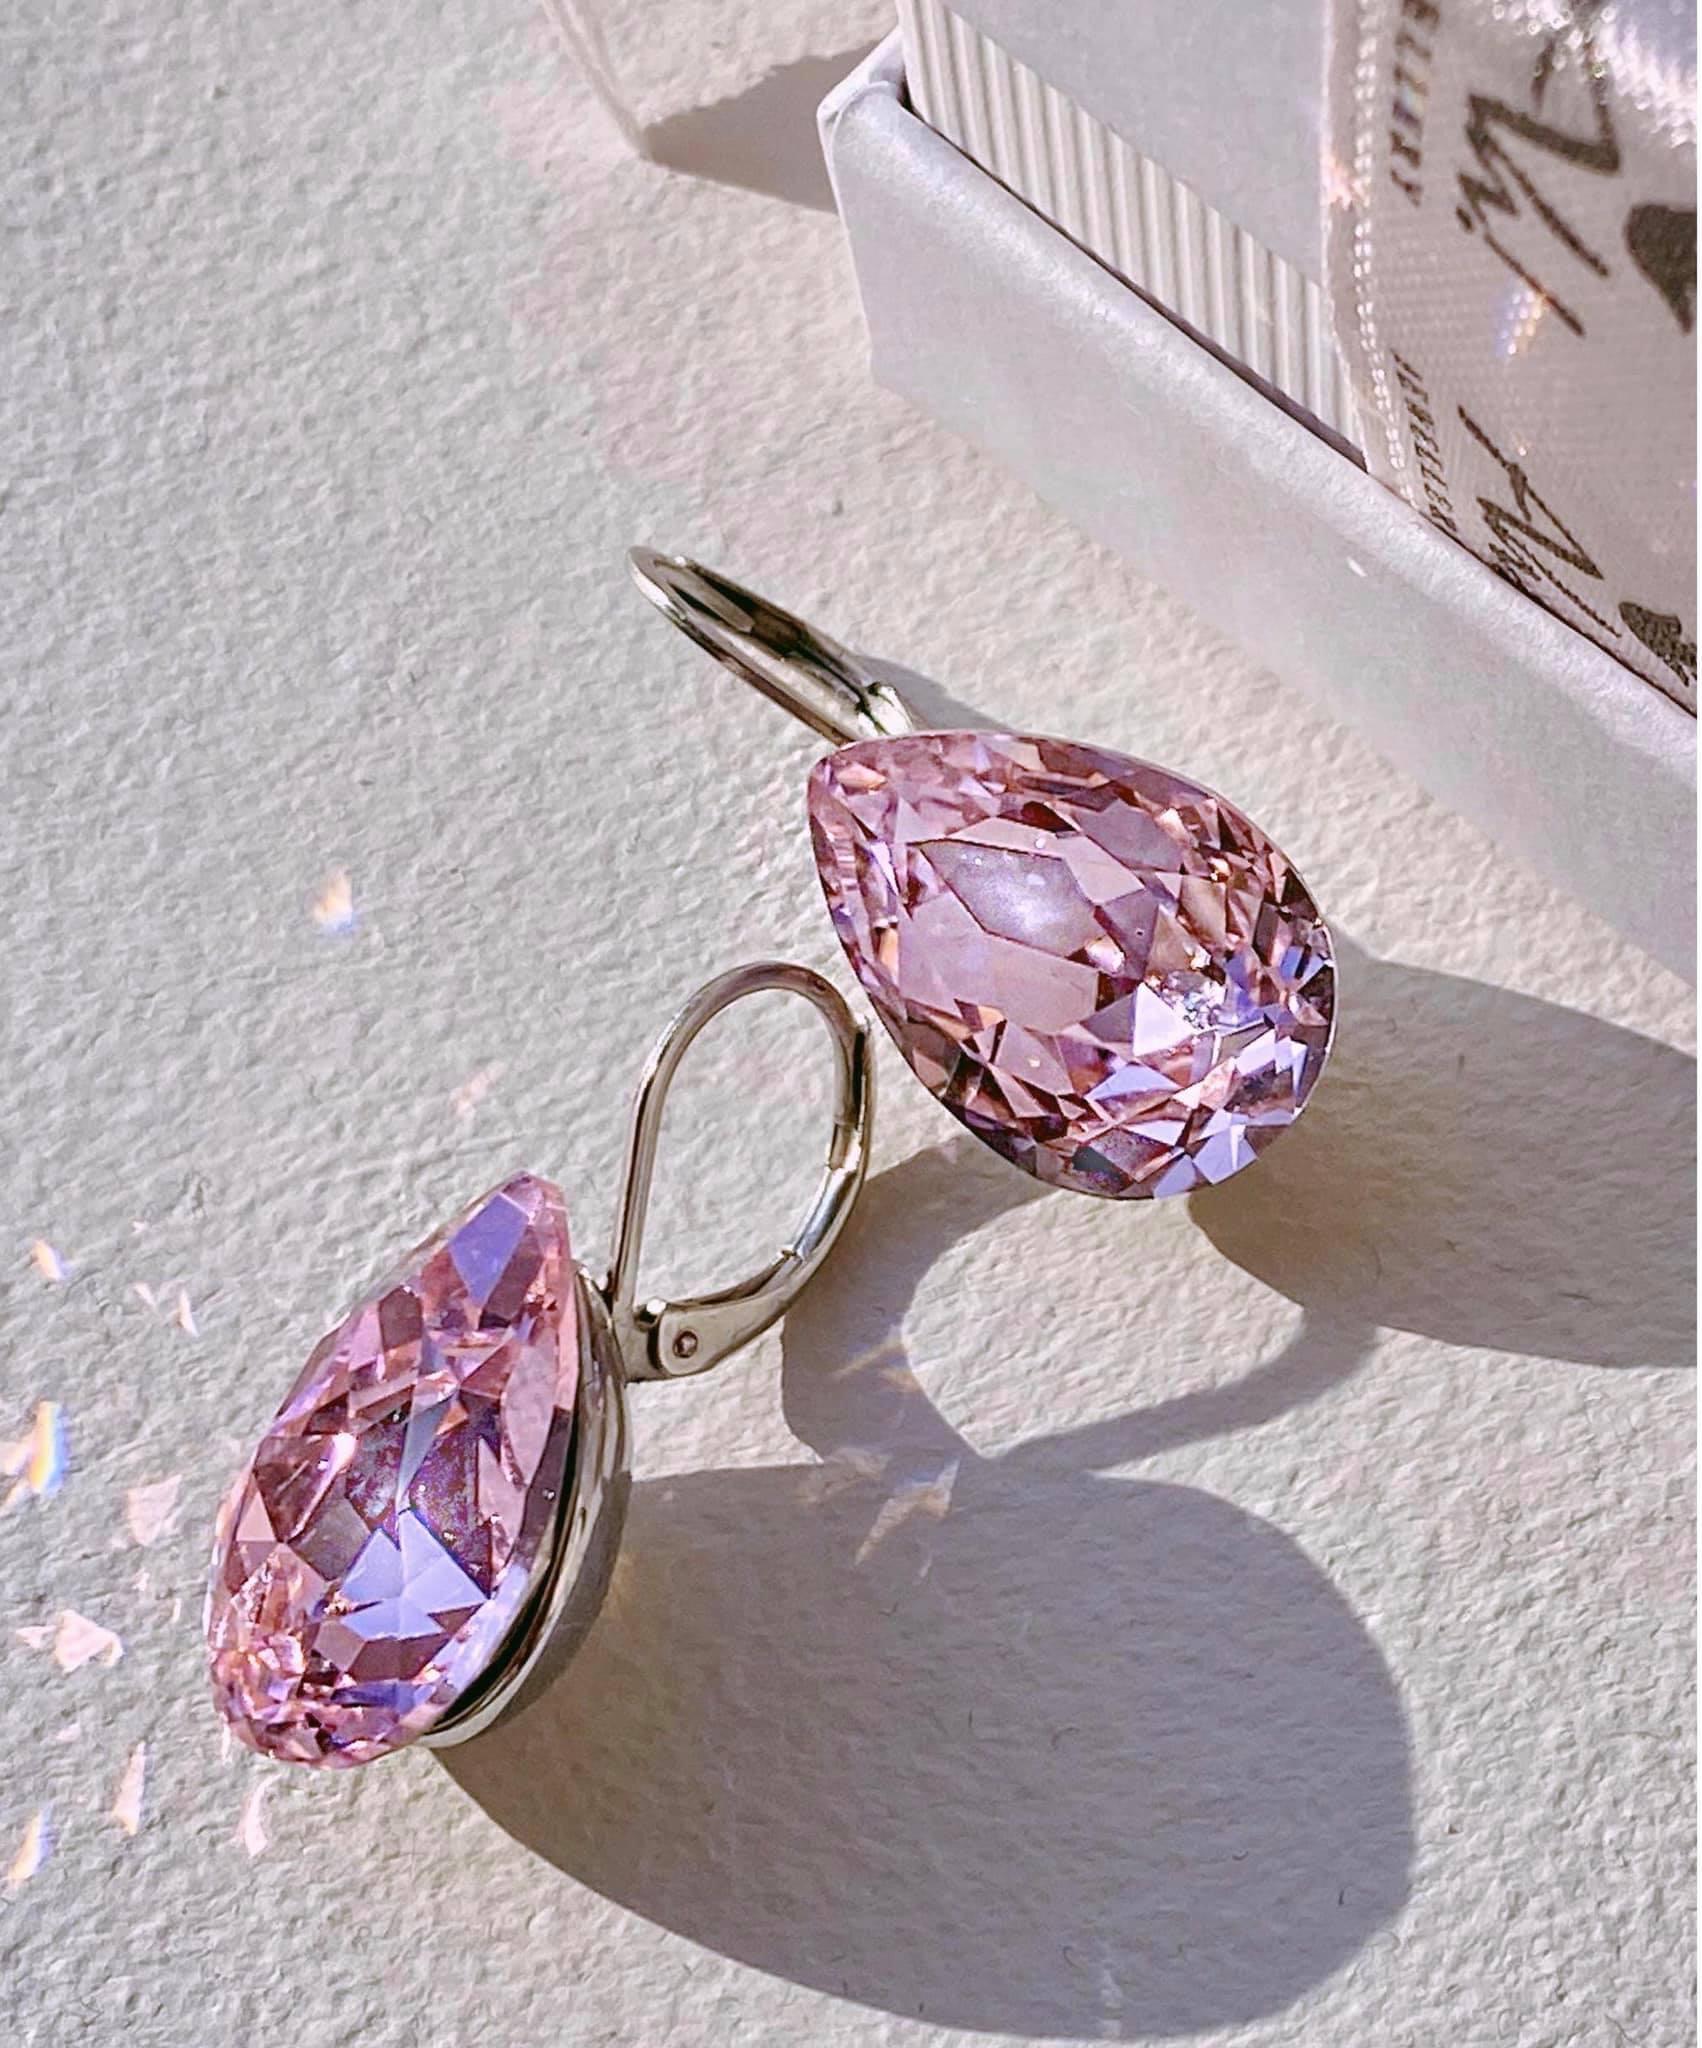 Ah! Jewellery